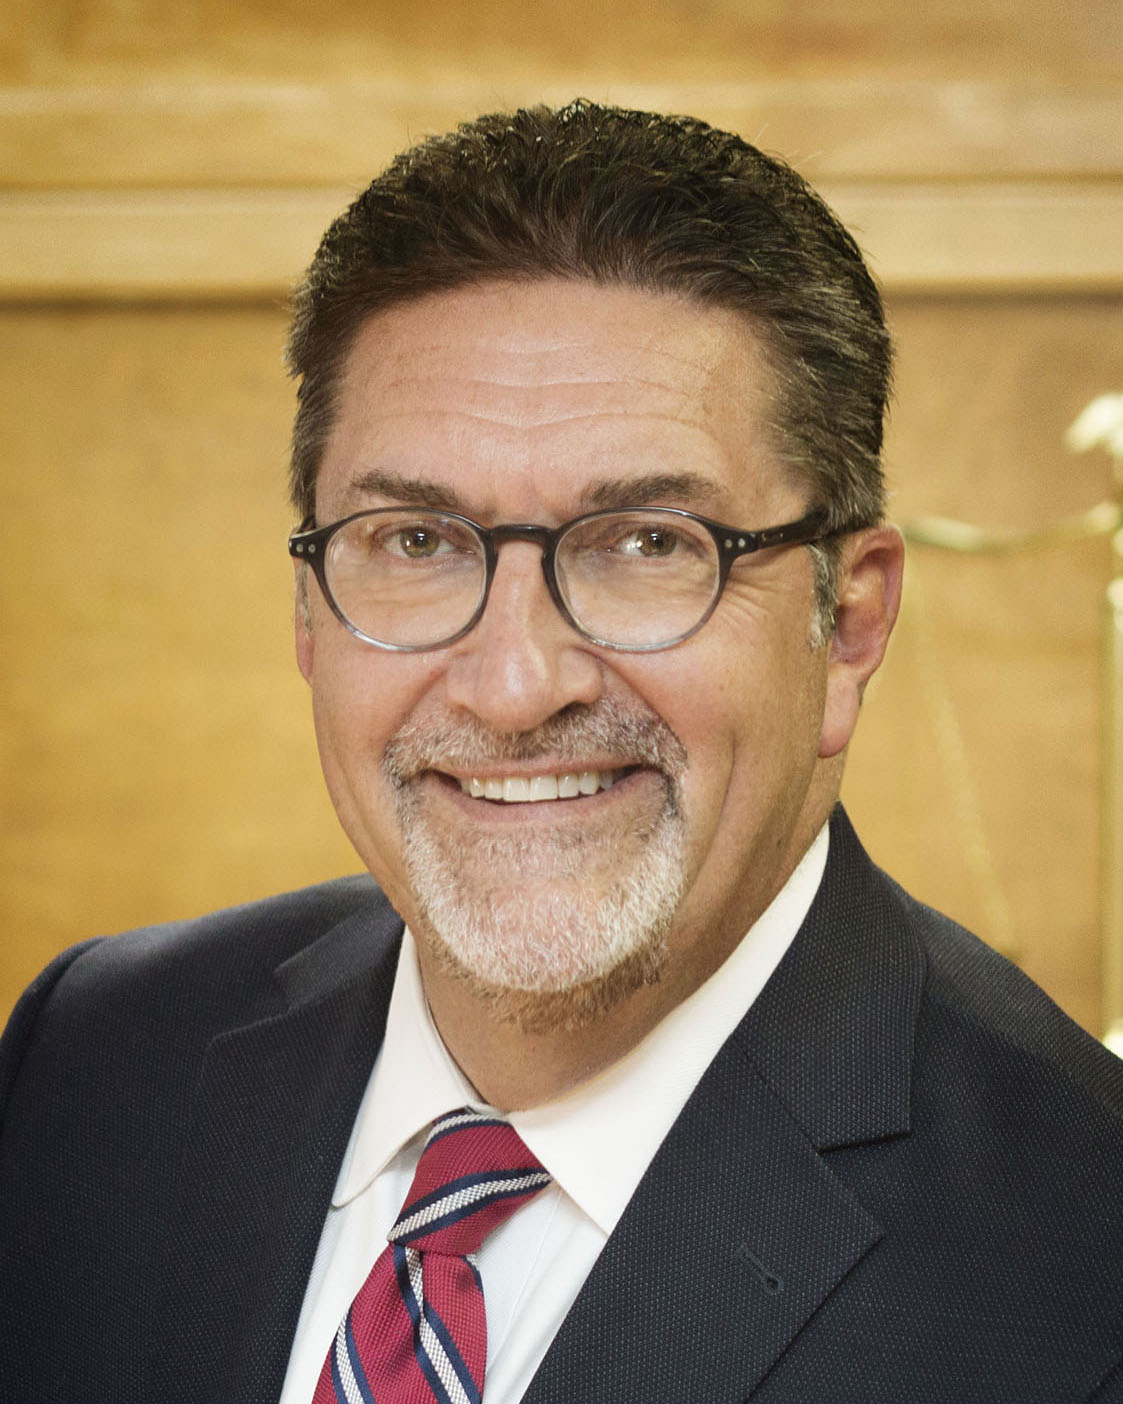 Executive Director Mark R. Hayes